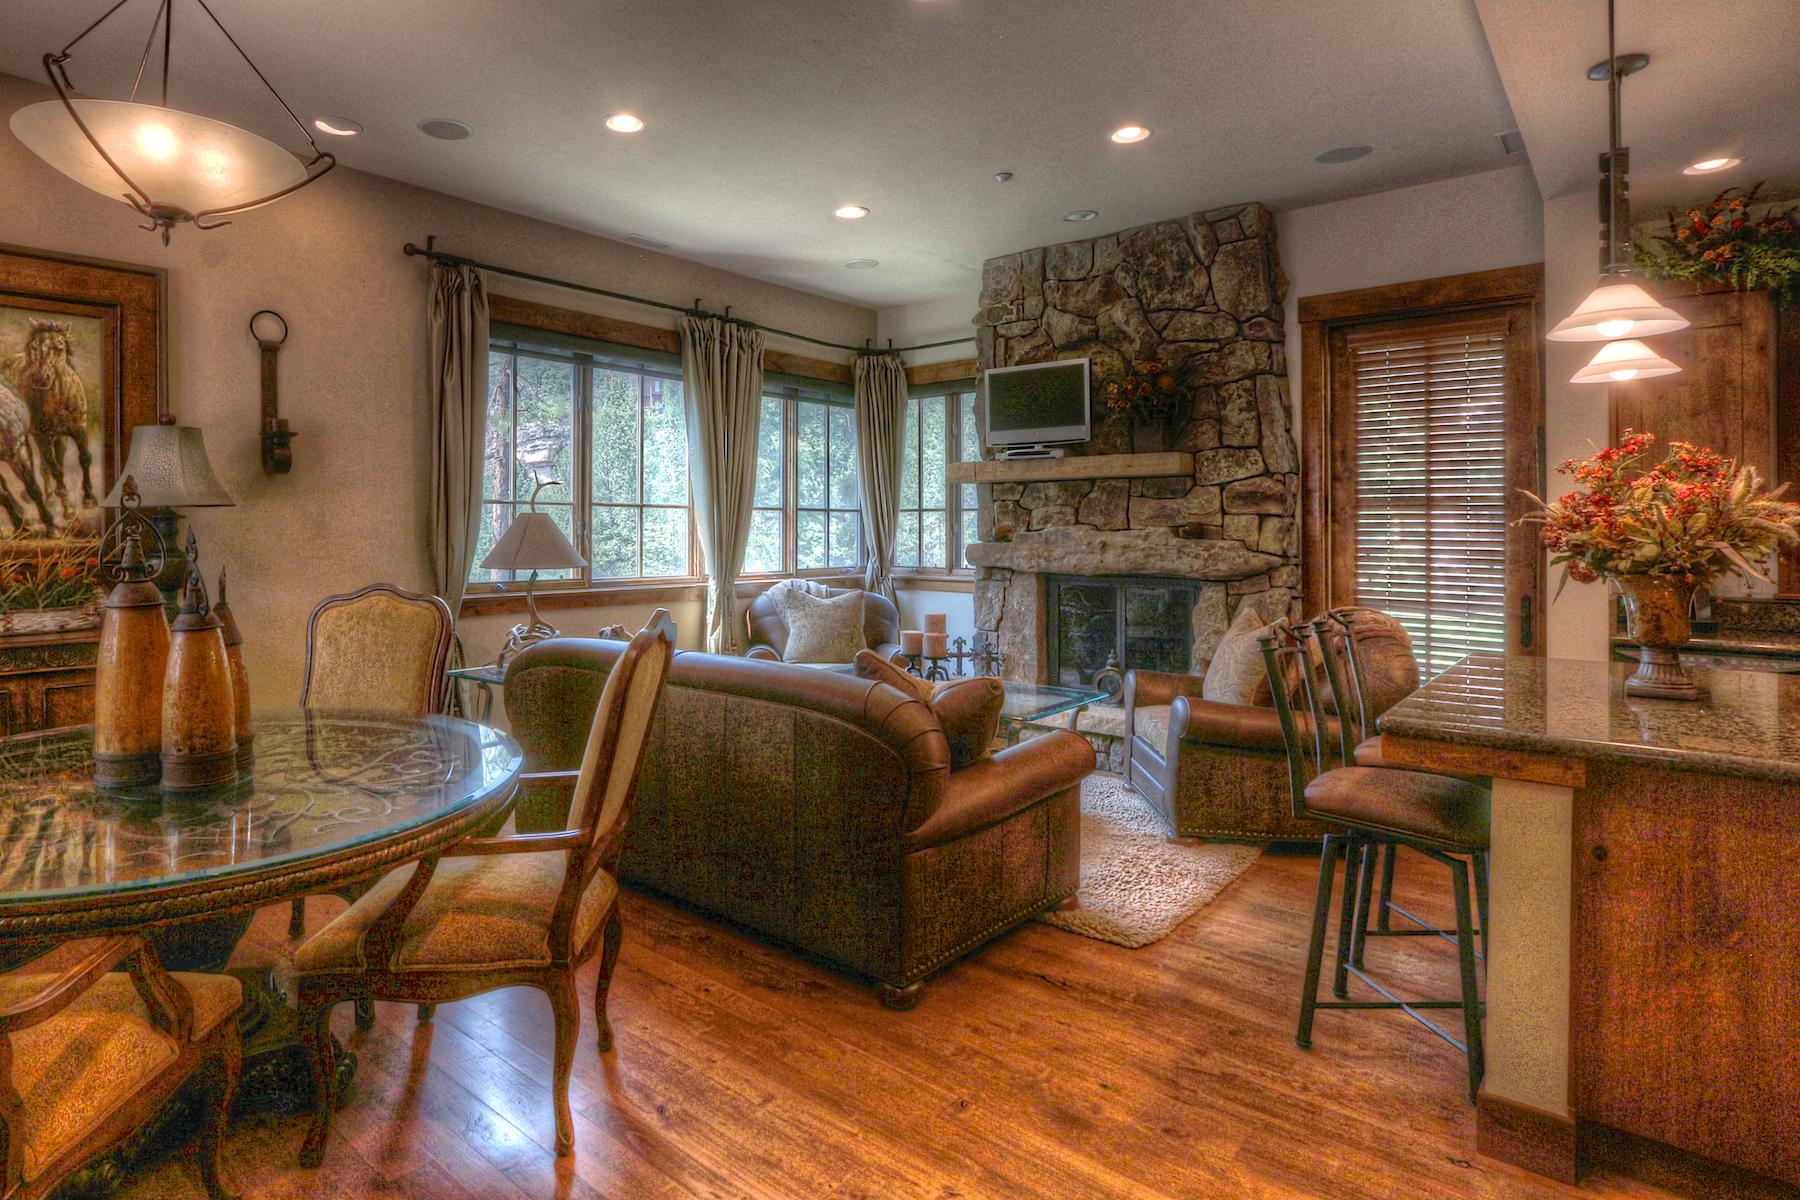 Additional photo for property listing at 590 Glacier Club Dr. #8 590 Glacier Club Drive #8 Durango, Colorado 81301 United States